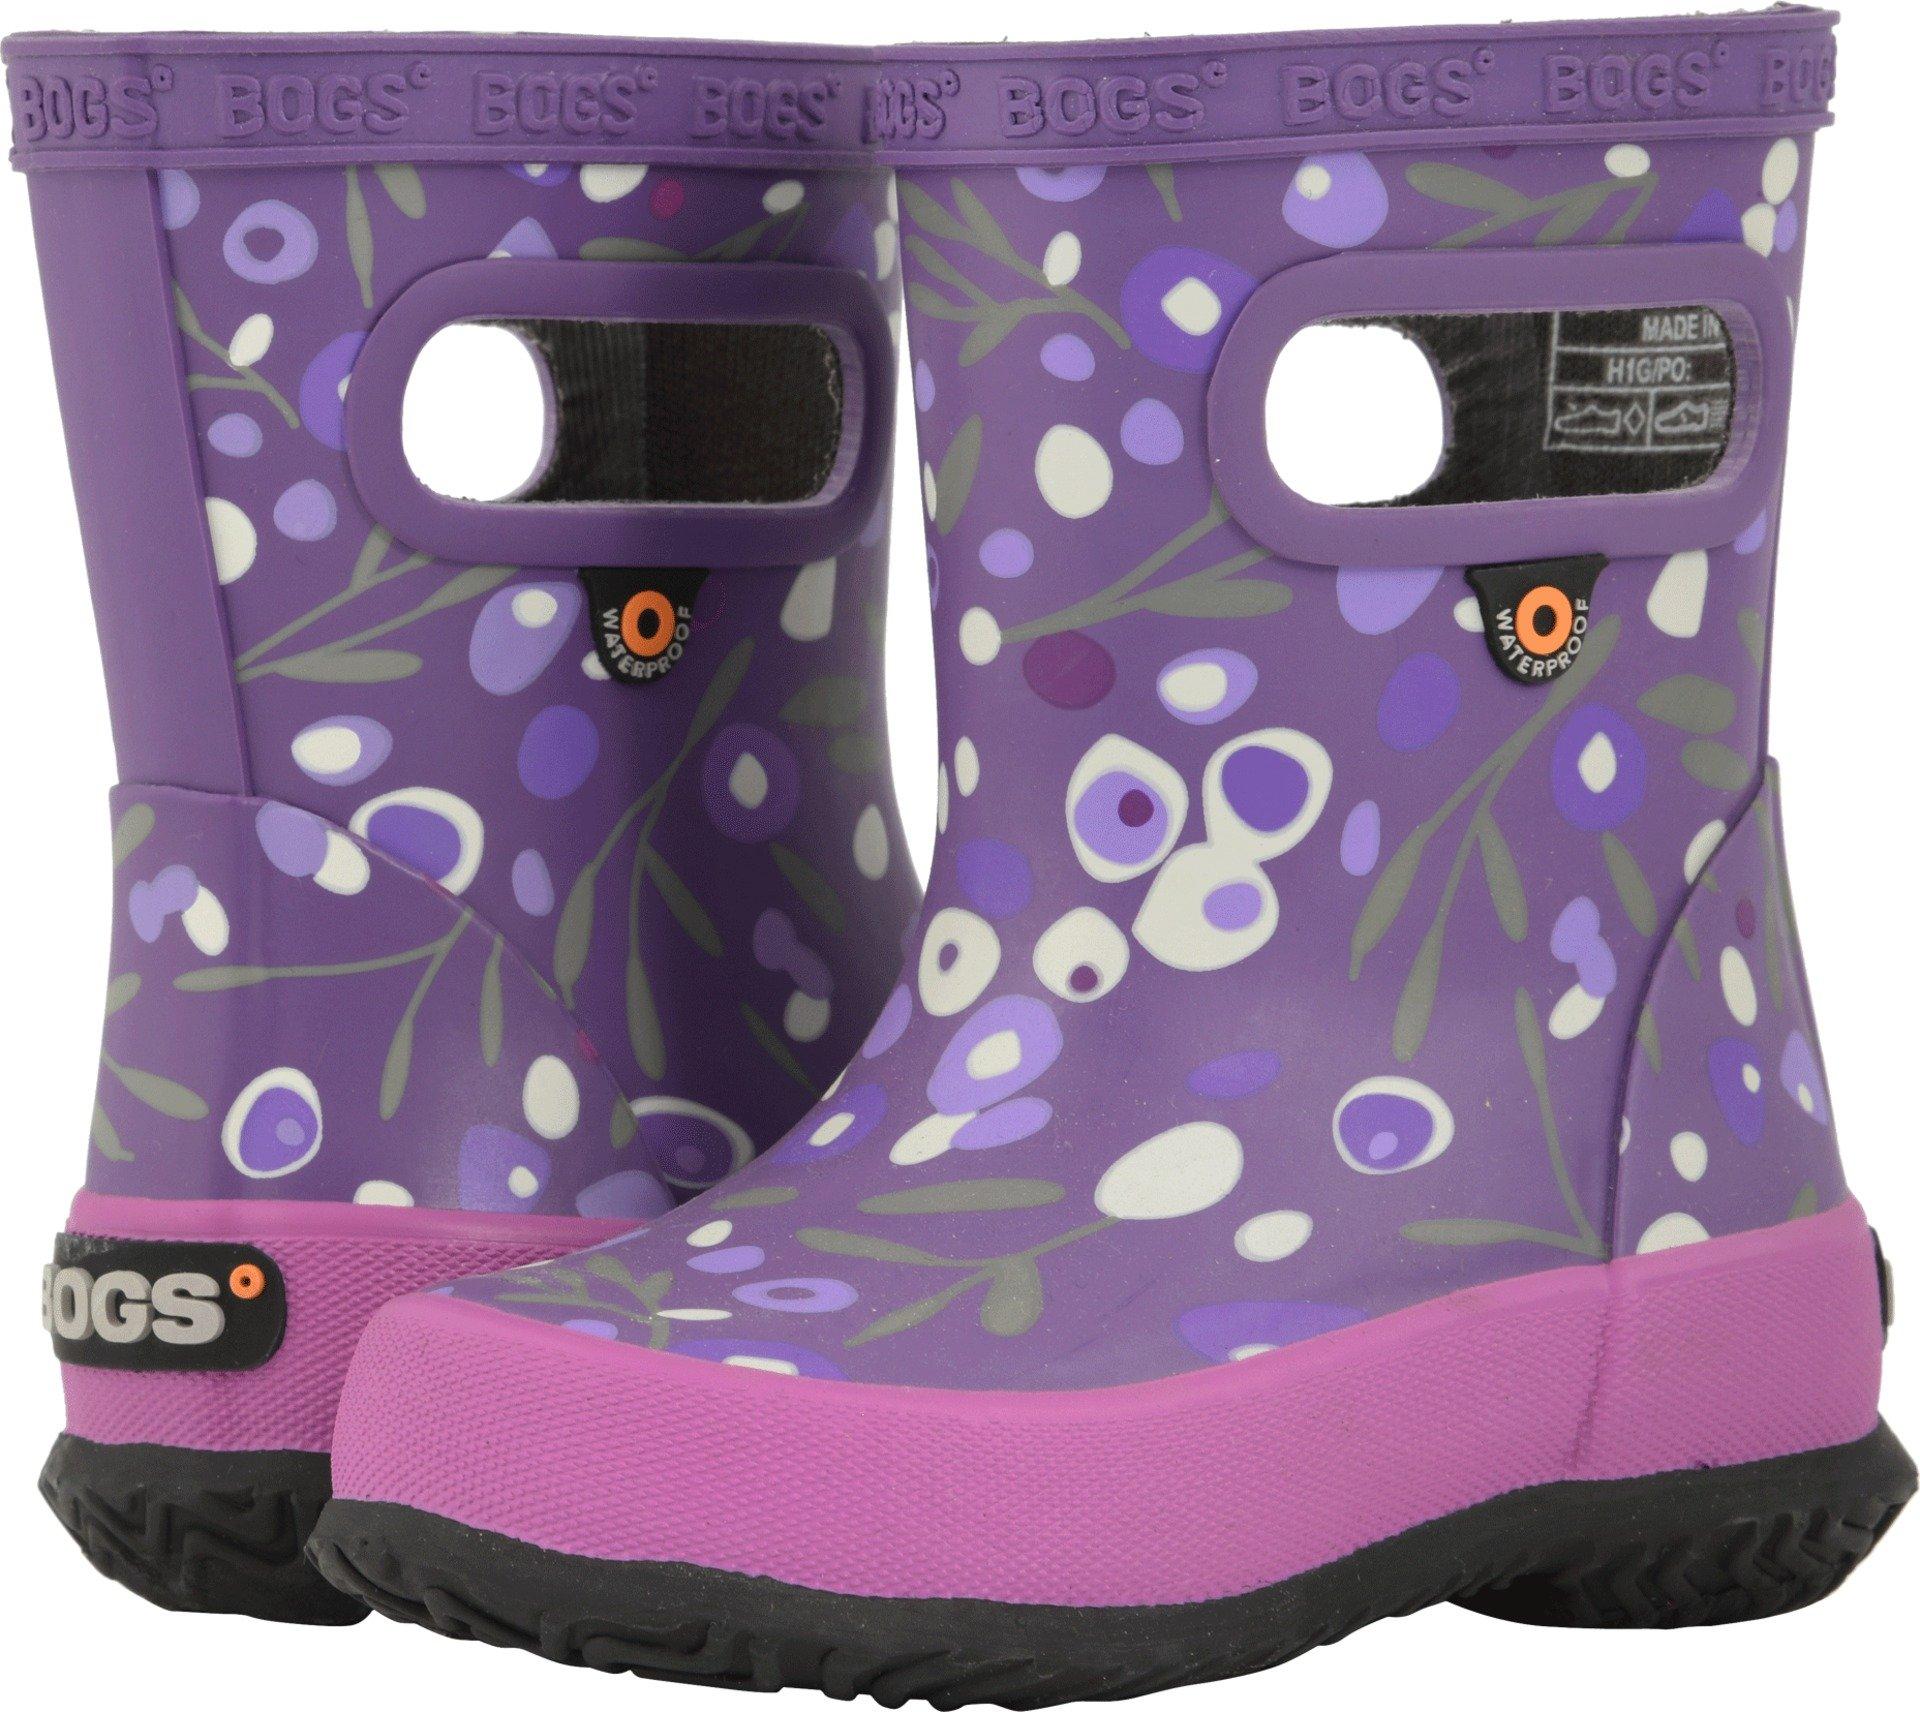 Bogs Skipper Kids Waterproof Rubber Rain Boot for Boys and Girls, Cattail Print/Purple/Multi, 9 M US Toddler